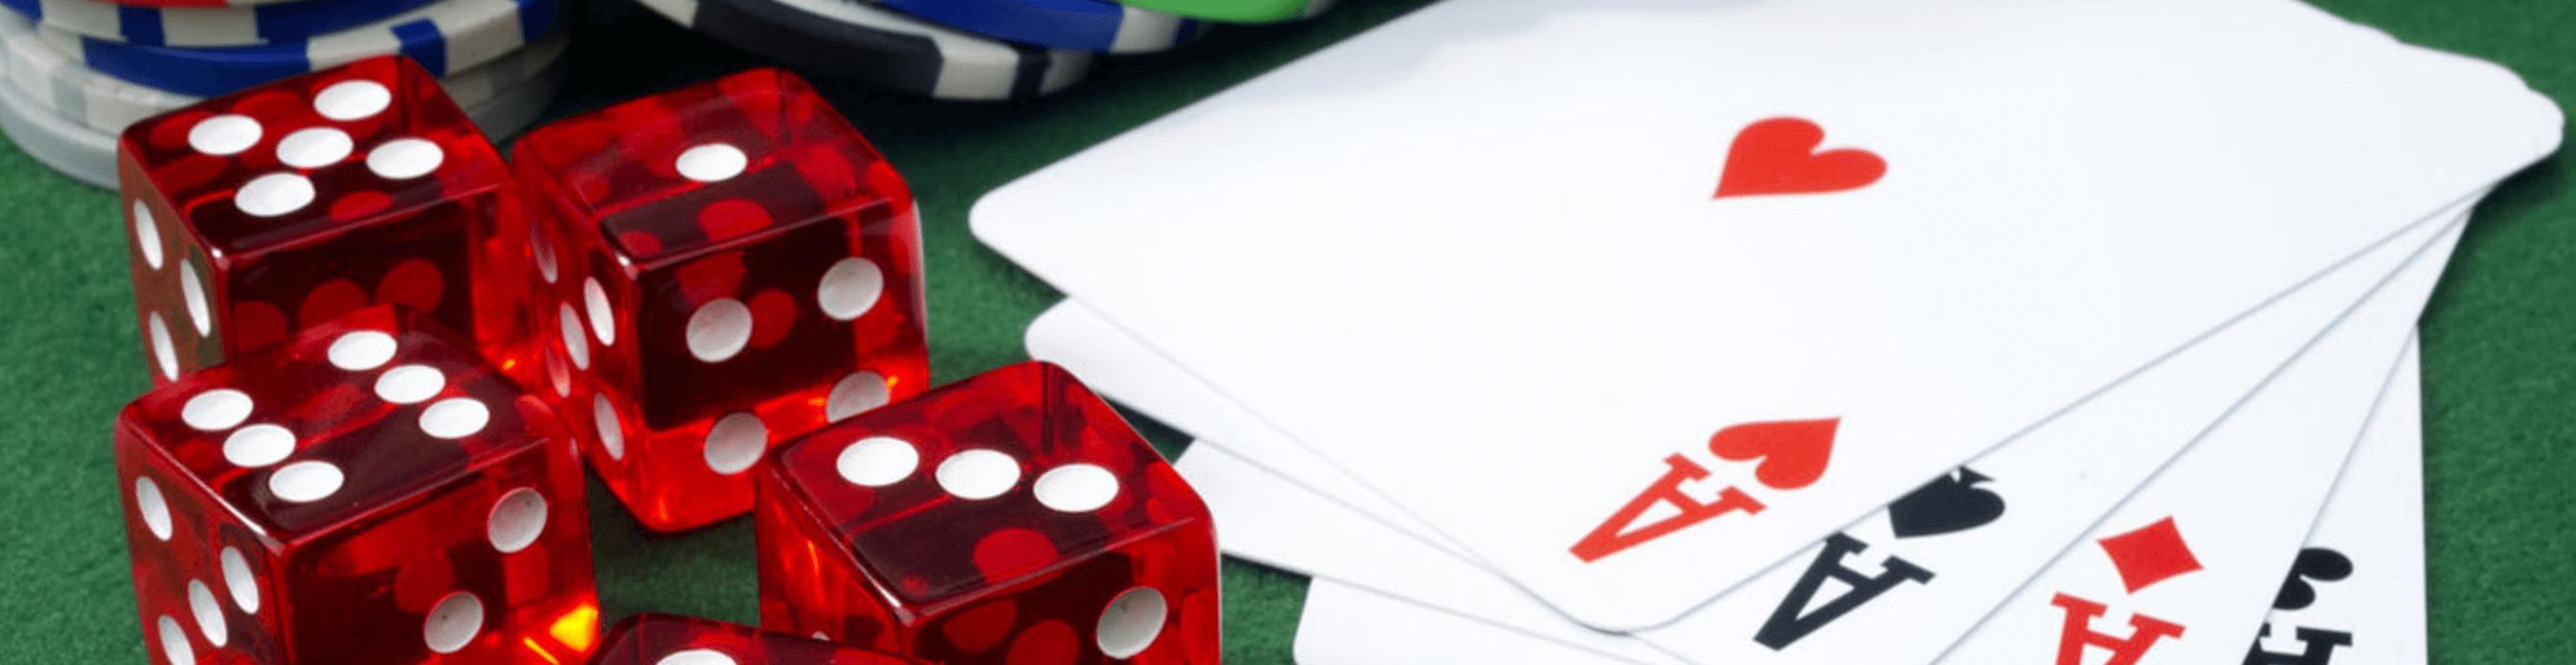 gambling close up